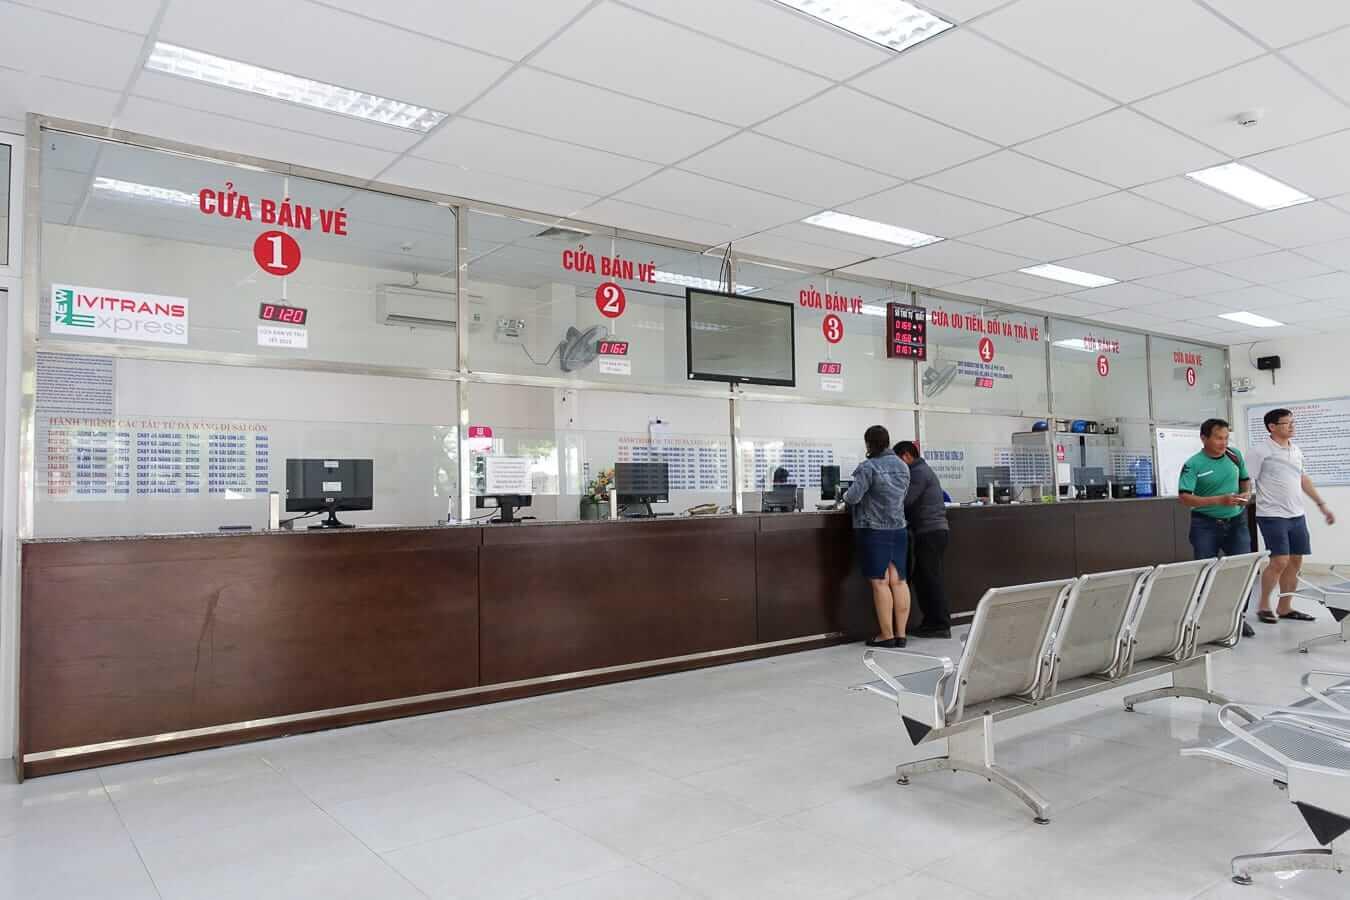 Da Nang Train Station ticket office